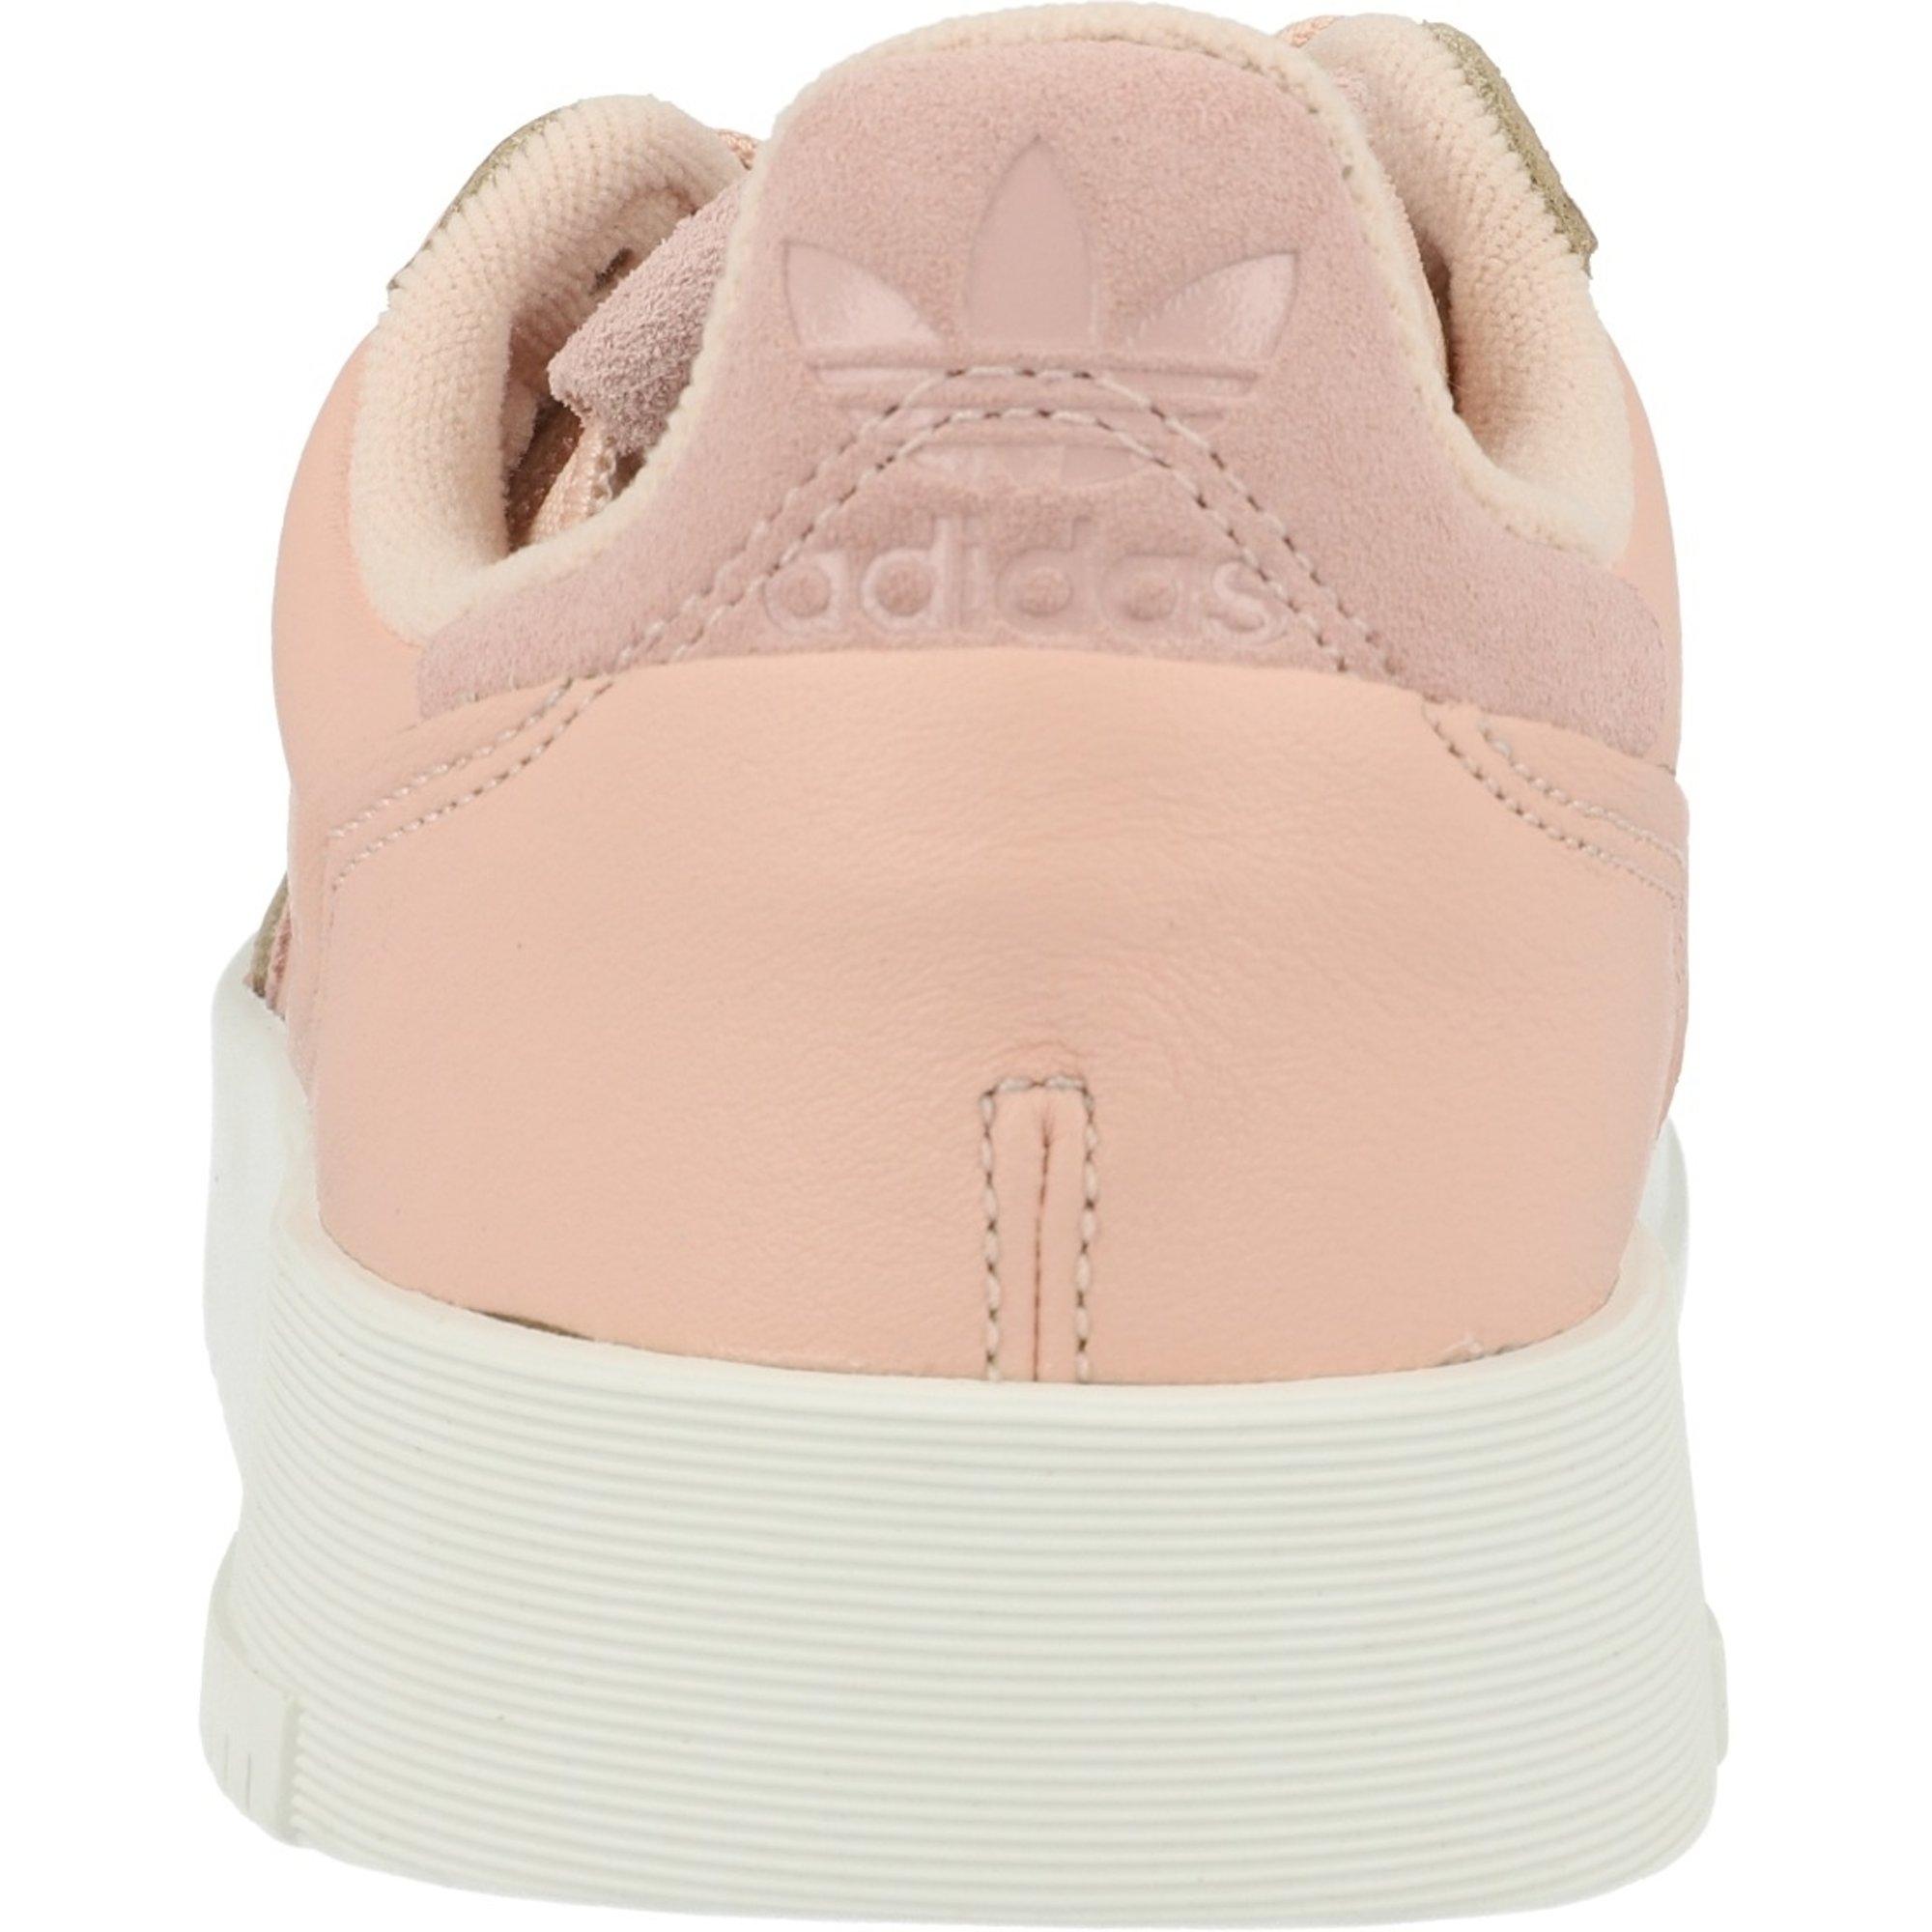 adidas Originals Supercourt W Vapor Pink Leather Adult